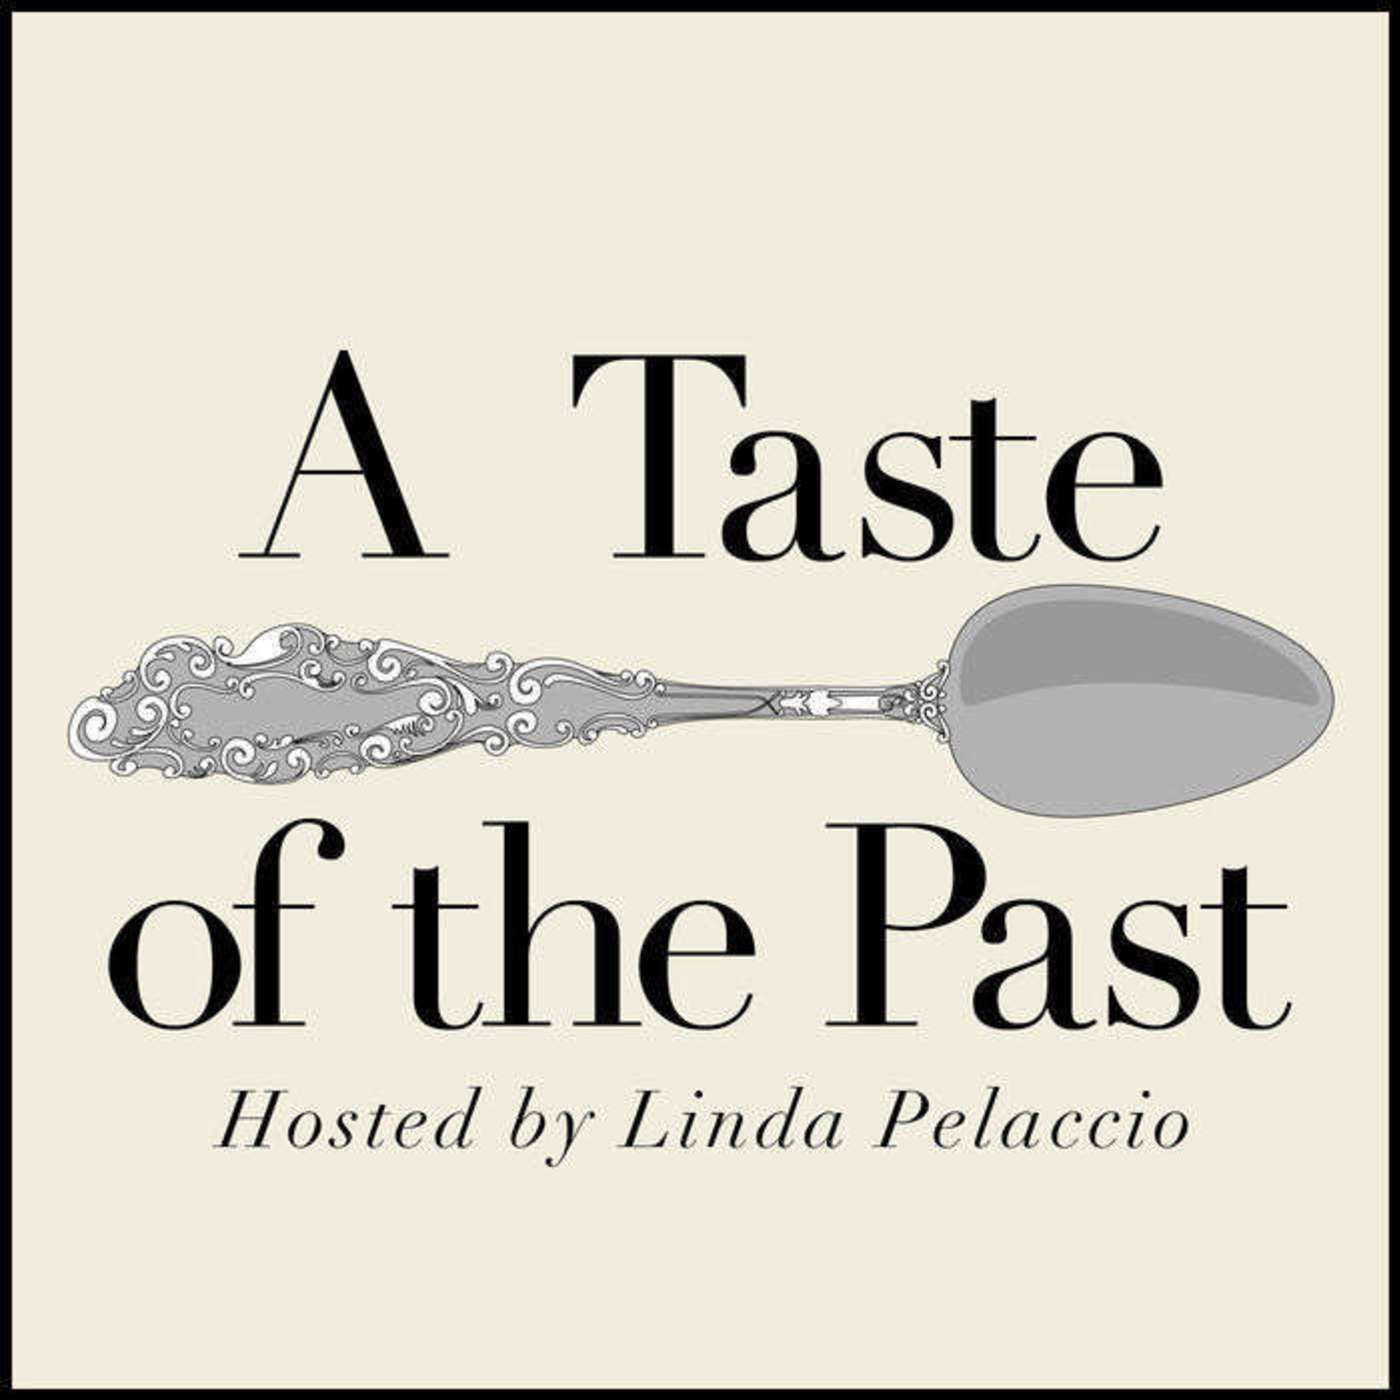 Episode 181: Bread with Lionel Vatinet